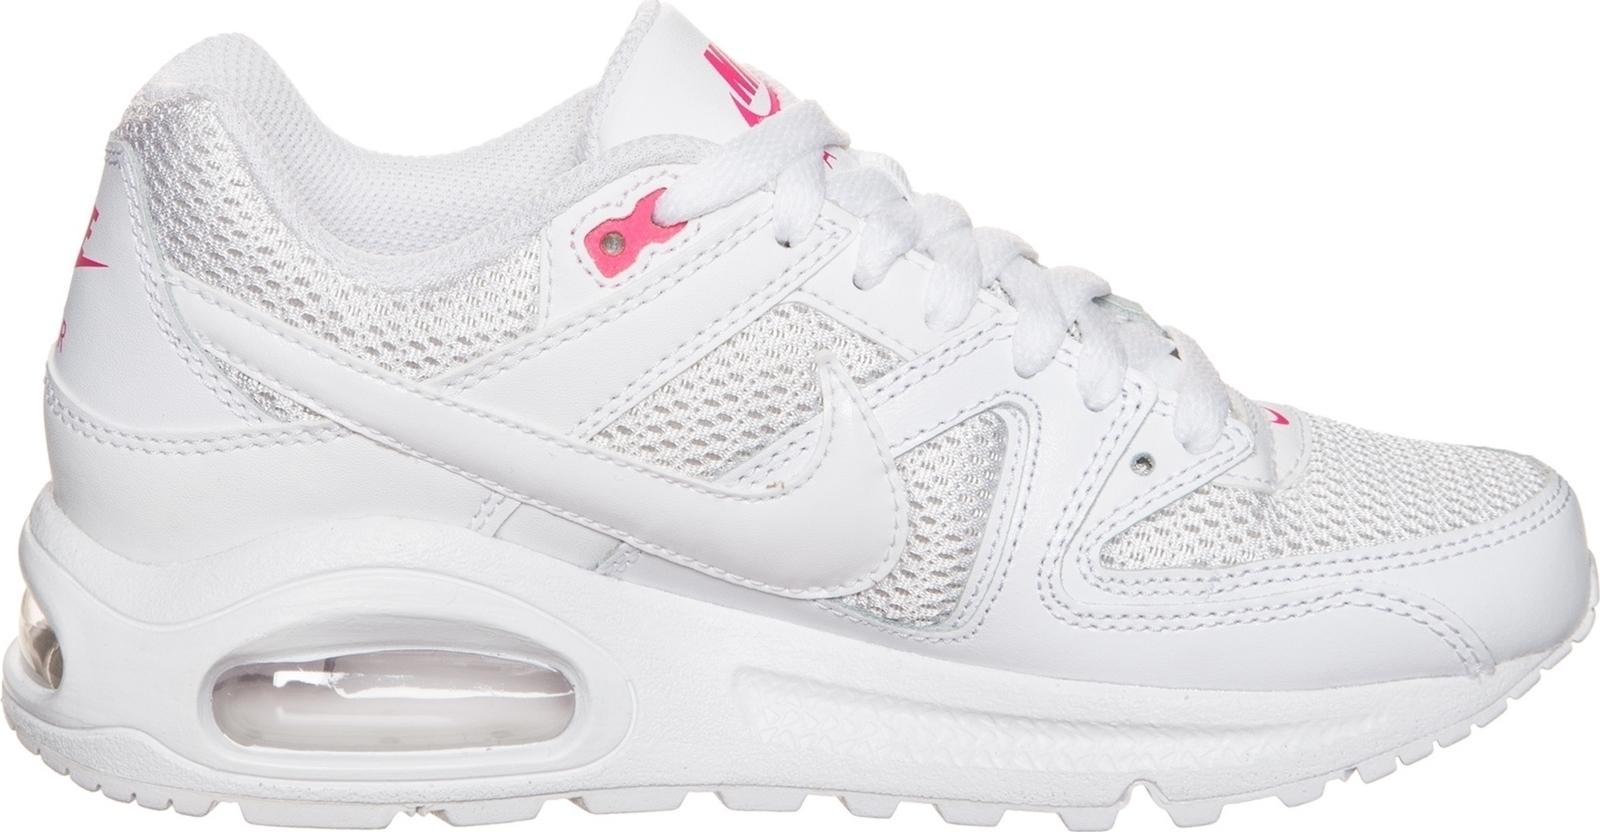 407626 012|Nike Air Max Command (GS) Black|38,5 USW 7,5